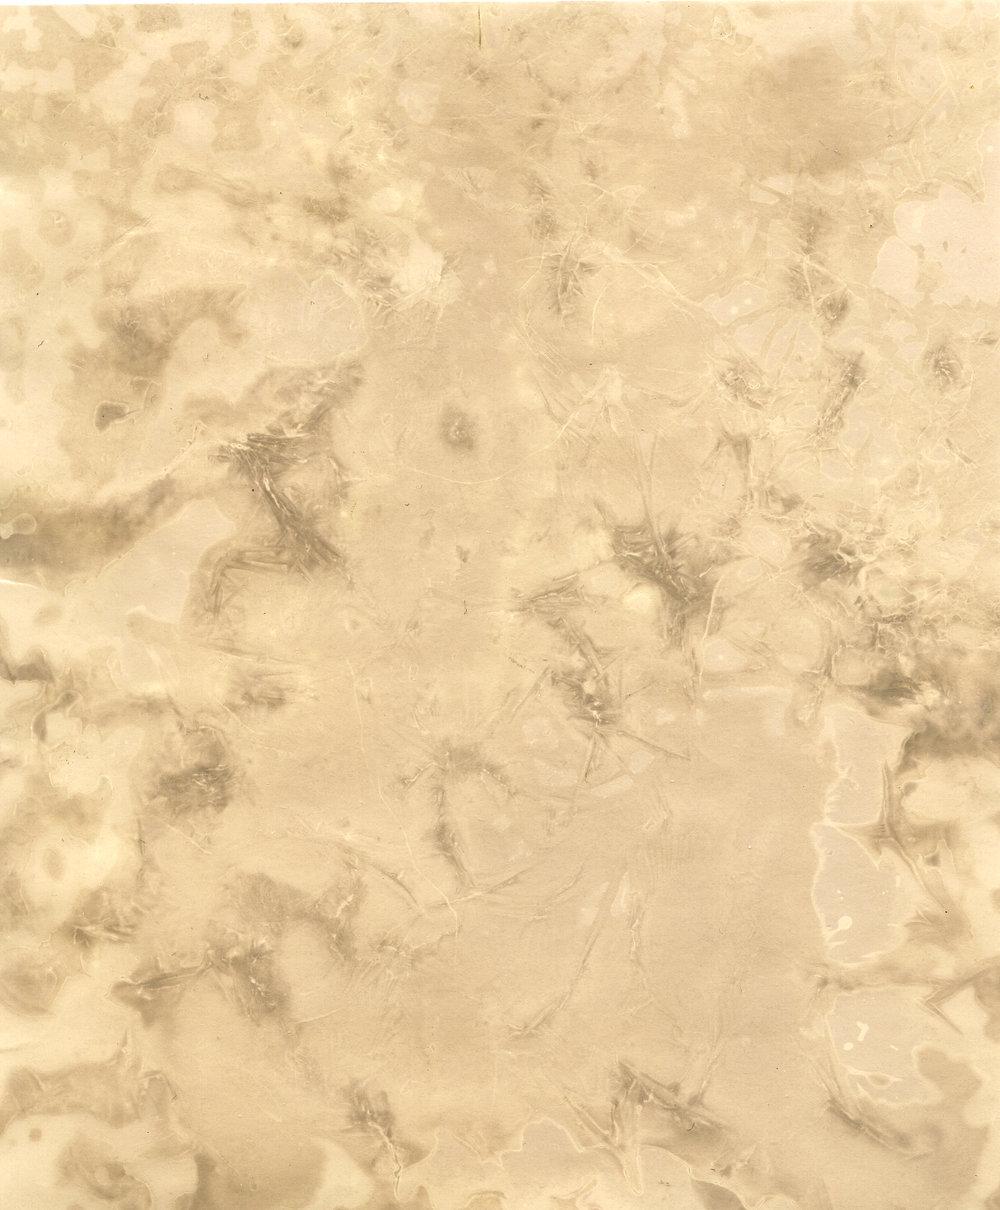 lumen-ice-5.jpg